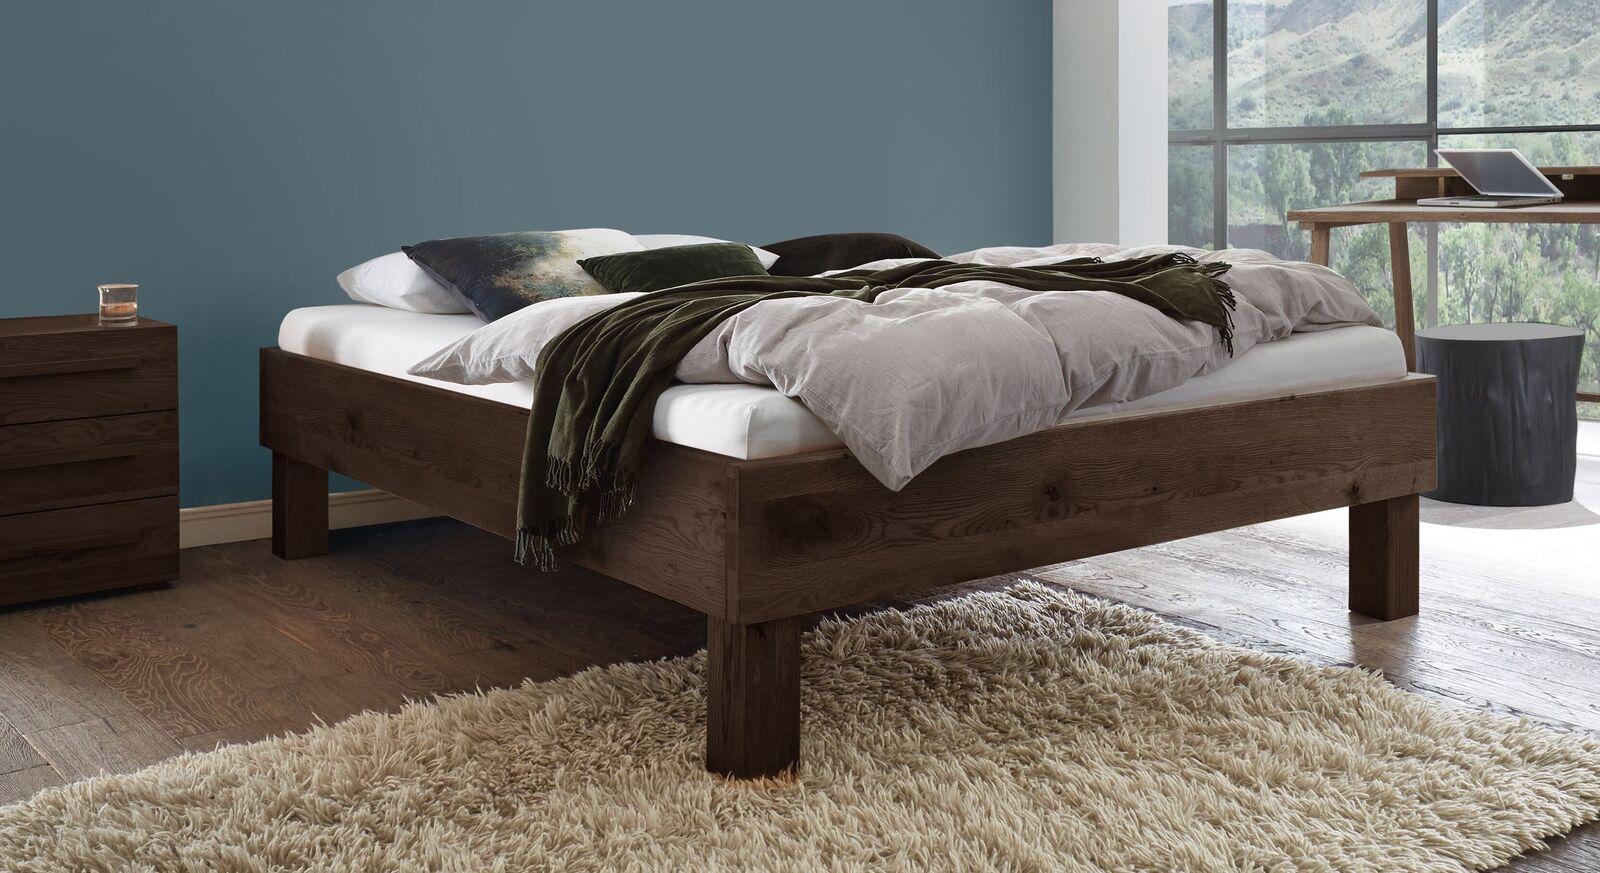 Massivholz-Liege Urmas mit Komfort-Bettrahmenhöhe